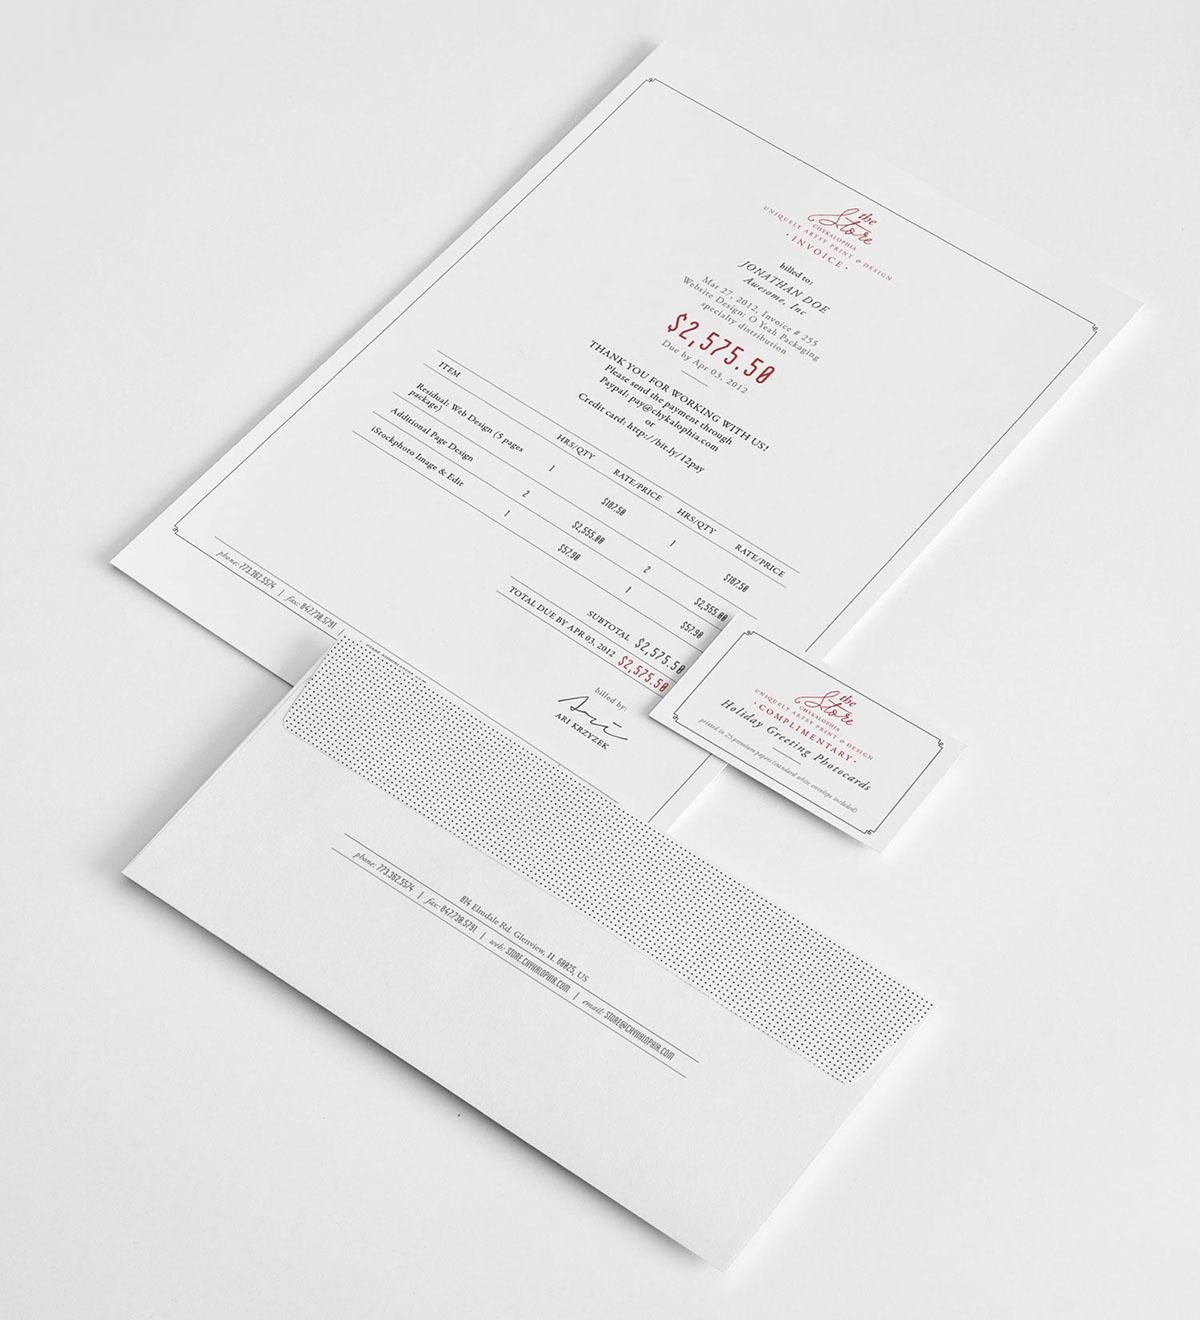 Professional Invoice Template by Ari Krzyzek